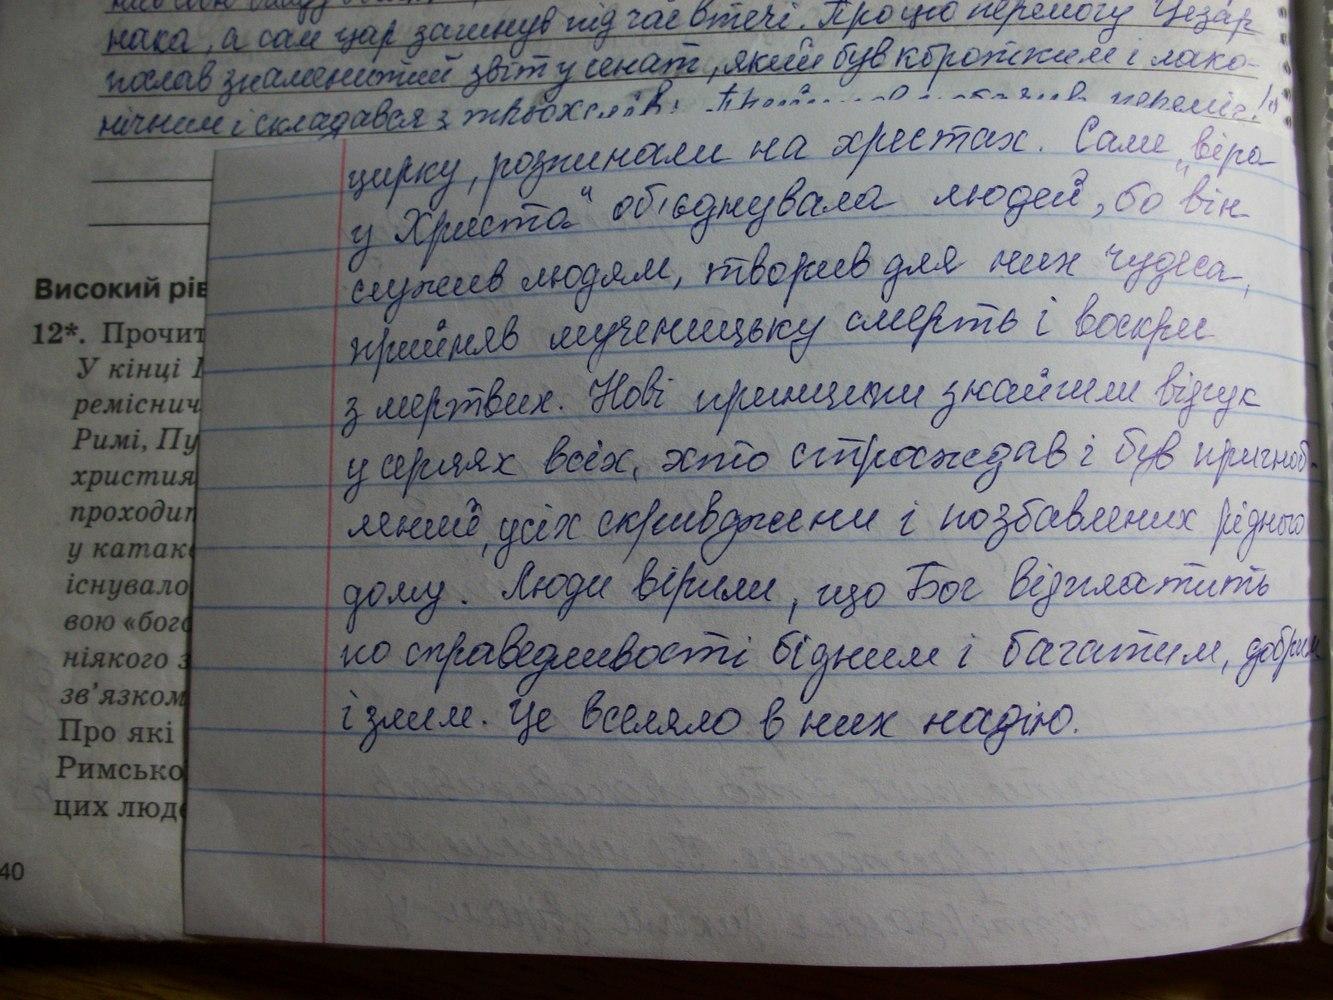 ГДЗ рабочие тетради 6 класс. Задание: стр. 30 (4)